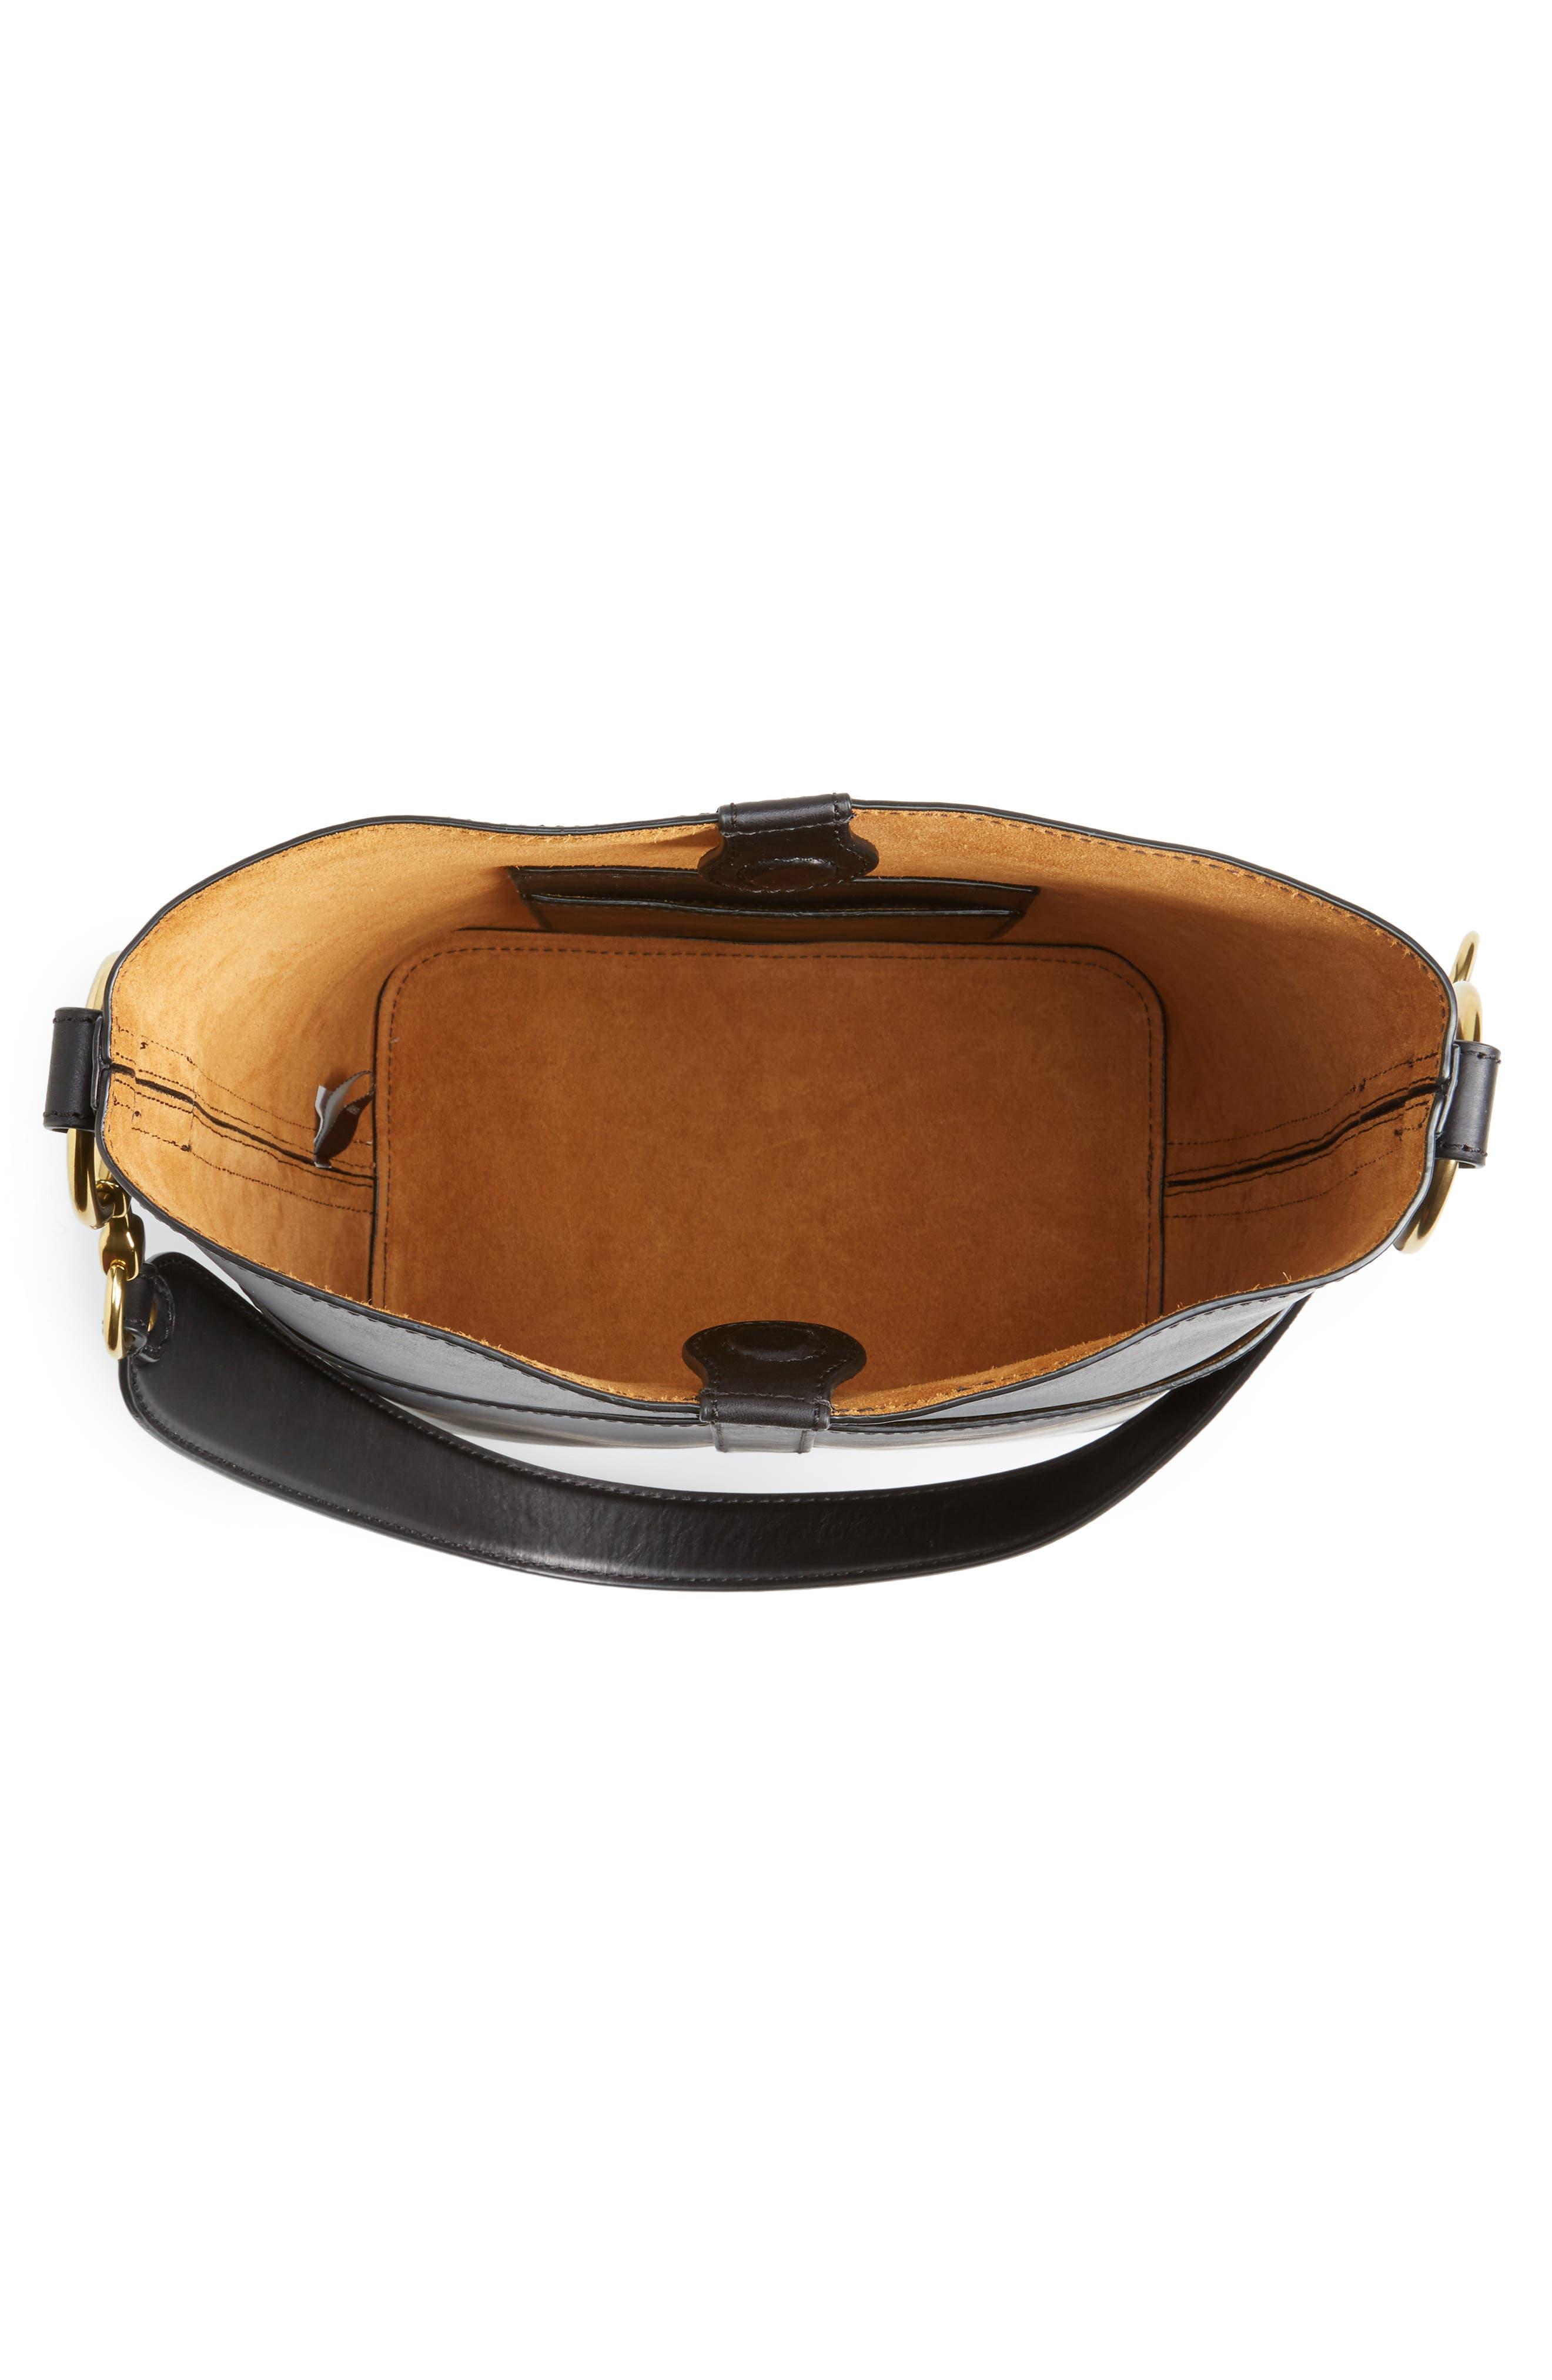 Ilana Harness Leather Bucket Hobo,                             Alternate thumbnail 4, color,                             001